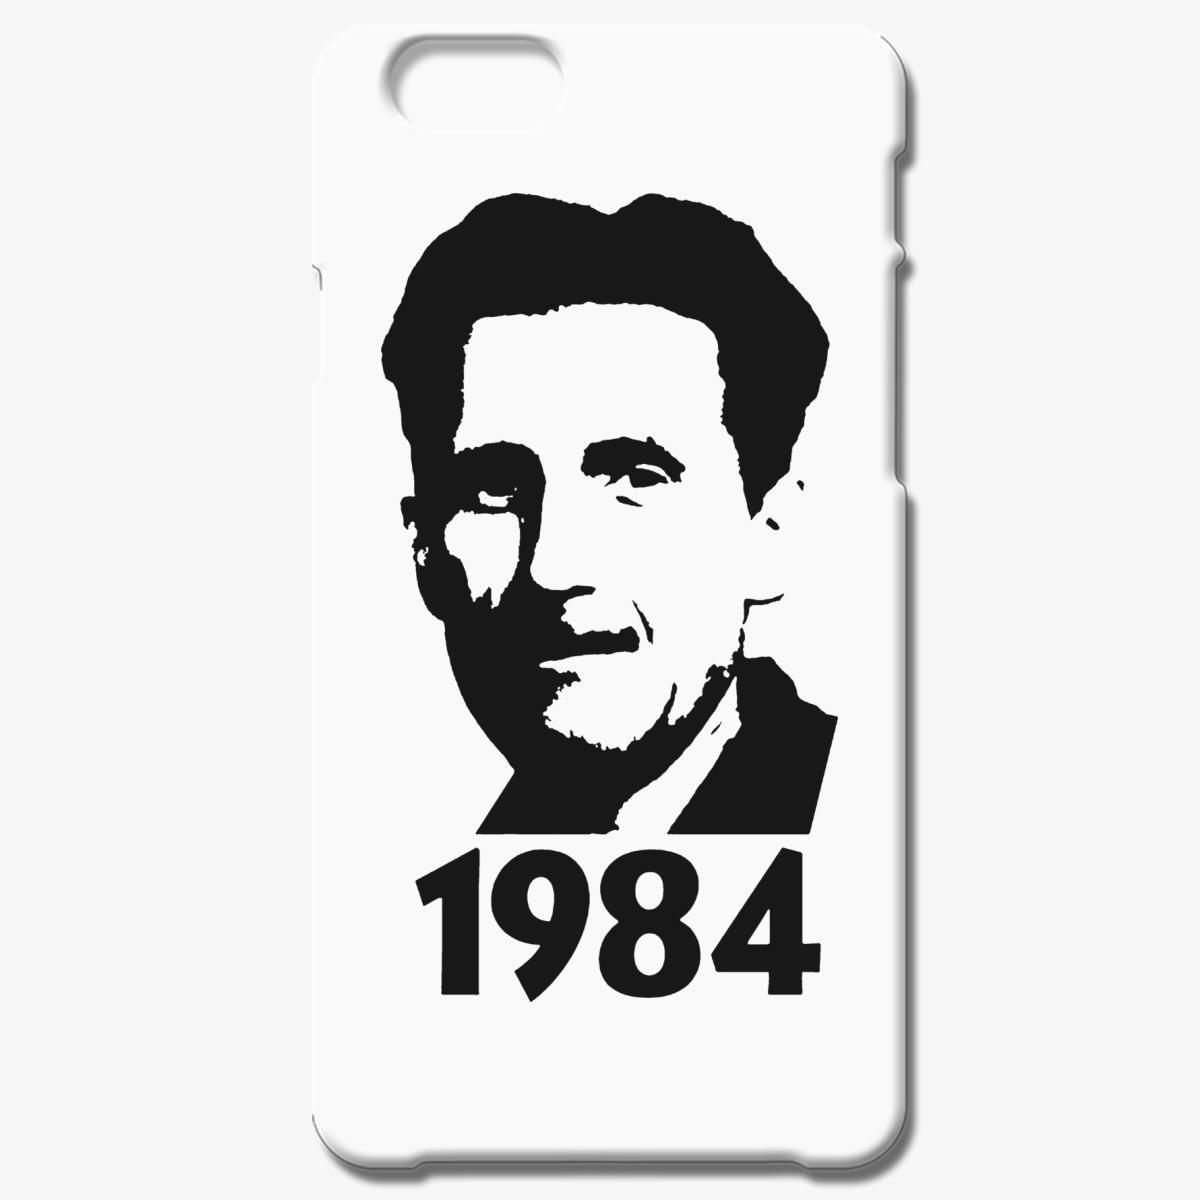 George Orwell Iphone 6 6s Plus Case